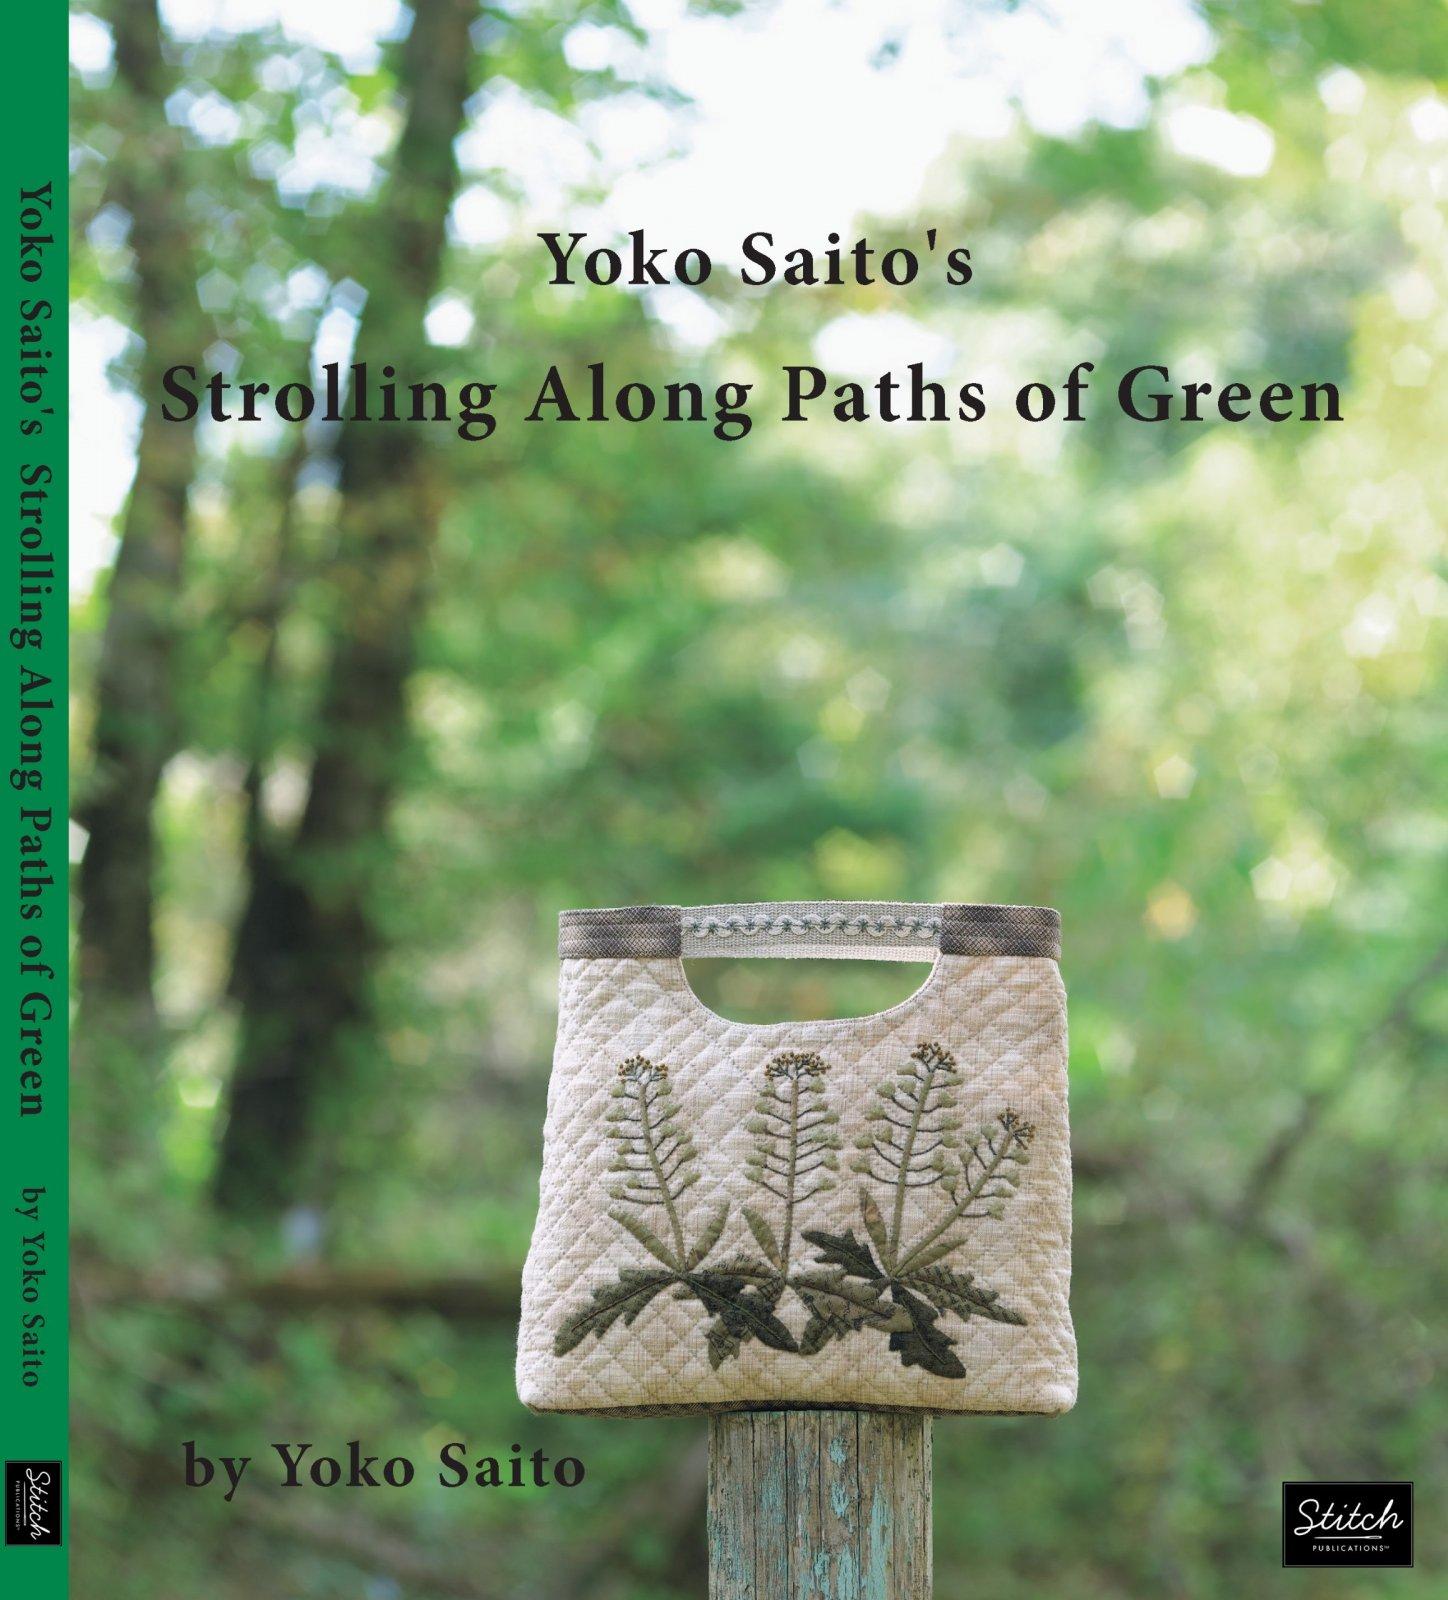 Yoko Saito Book:  Strolling Along Paths of Green - Nature's Regal Color